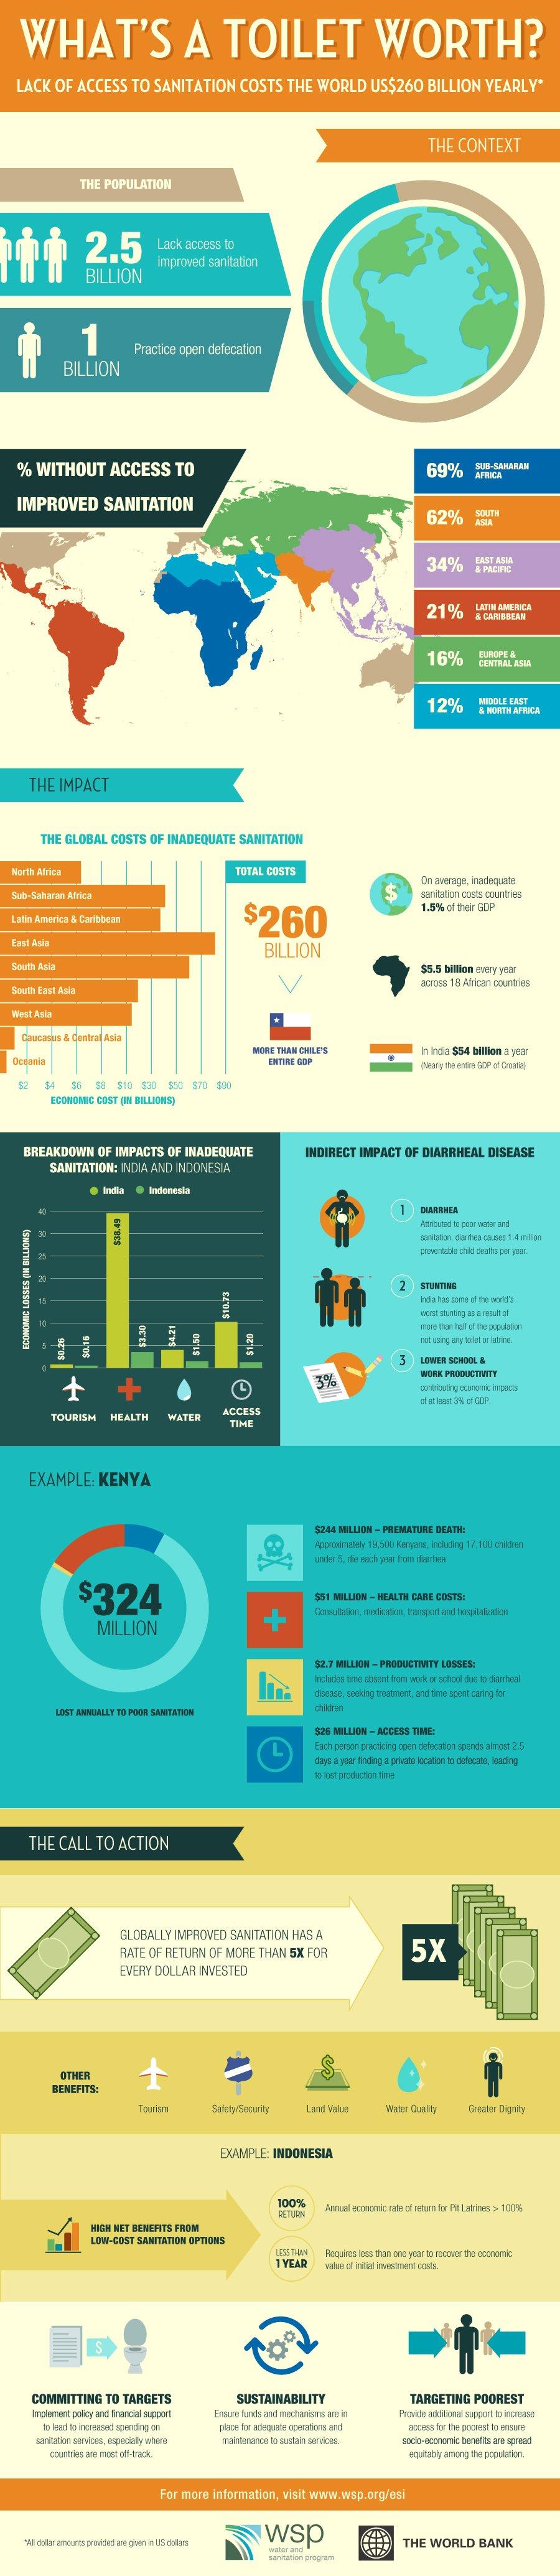 infographic-sanitation-esi-900x4140.jpg